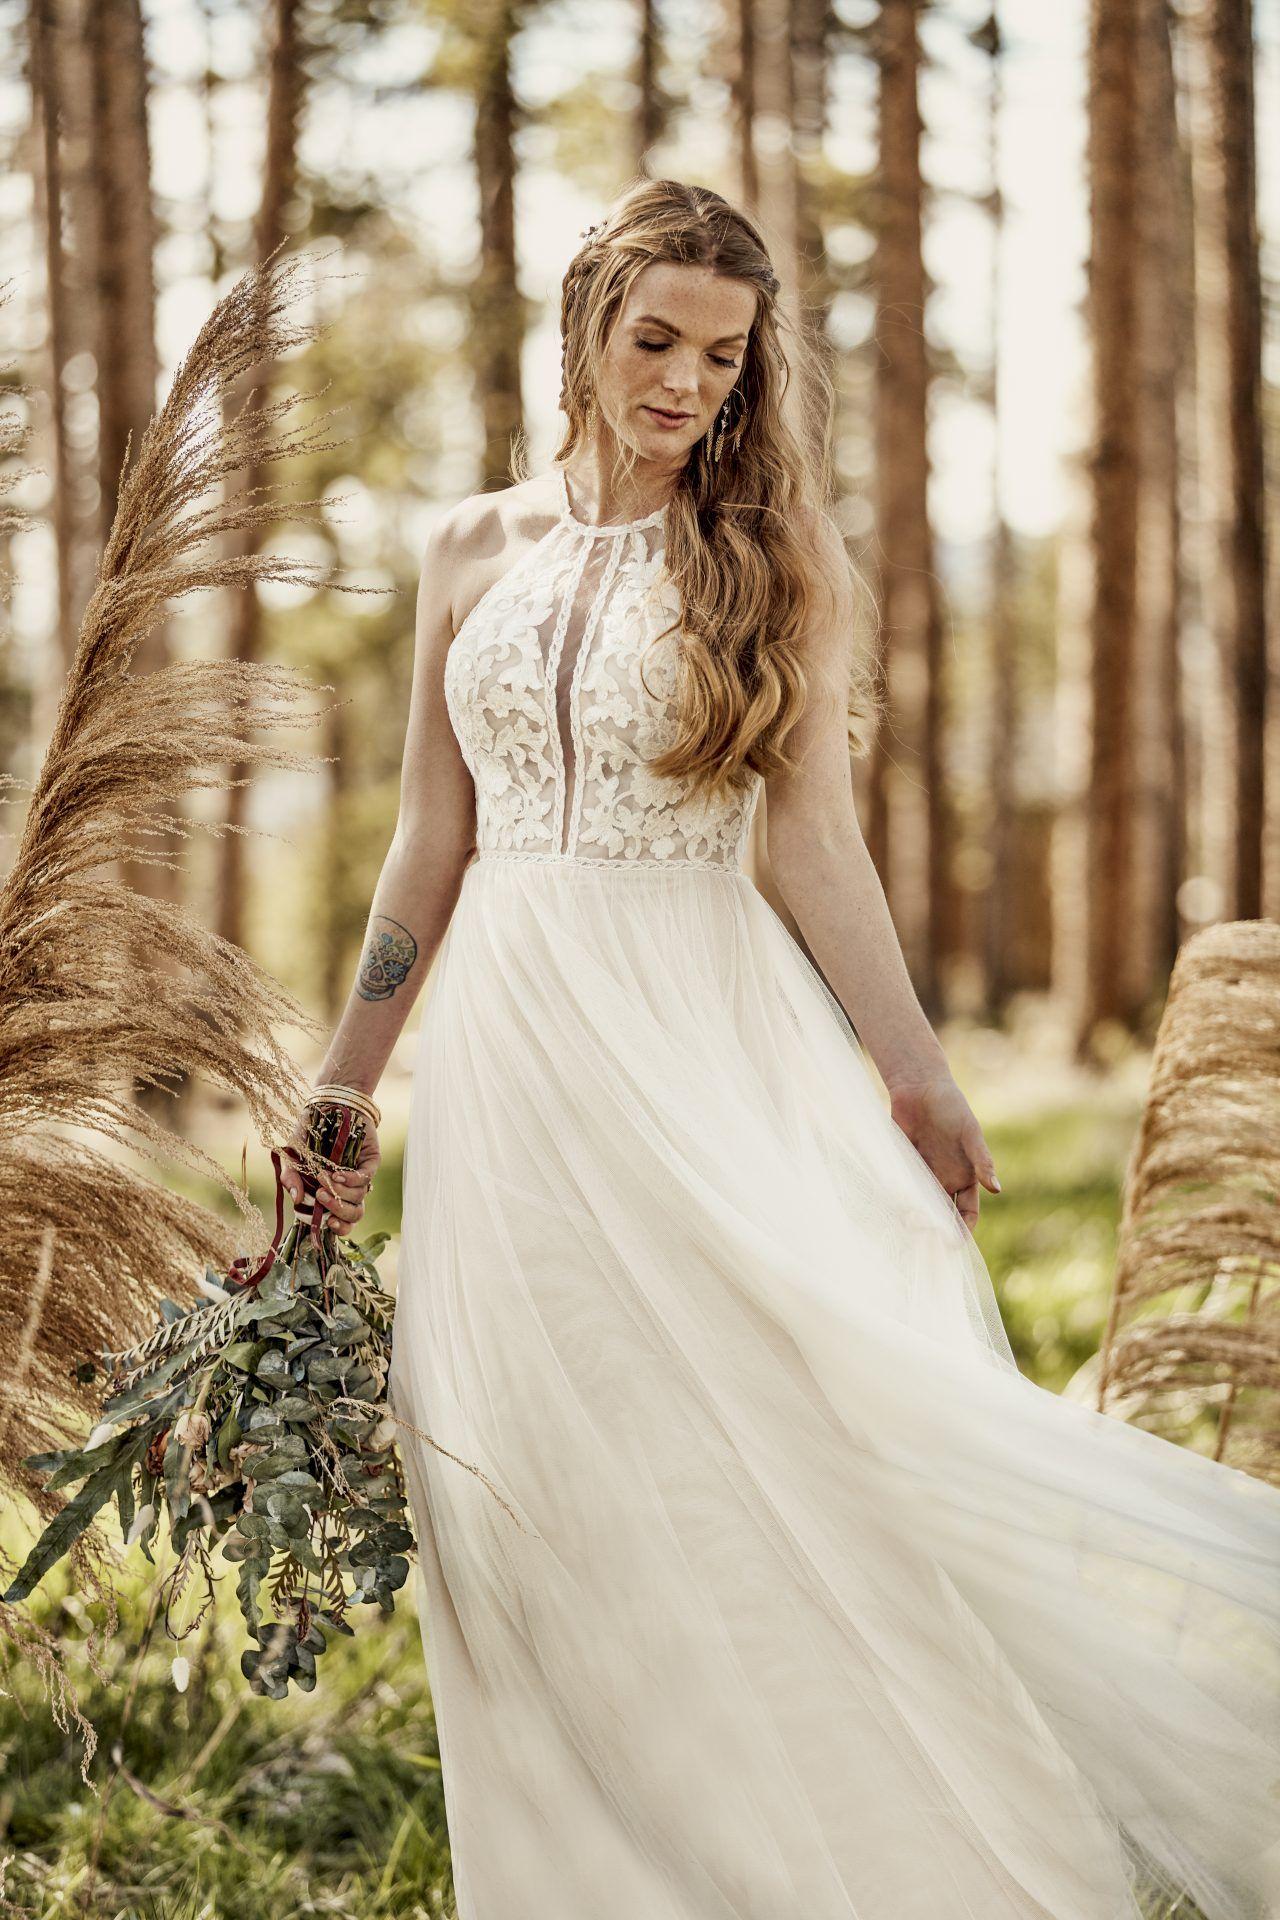 All Who Wander Boho Wedding Gowns Boho Wedding Dress Summer Wedding Dress [ 1920 x 1280 Pixel ]